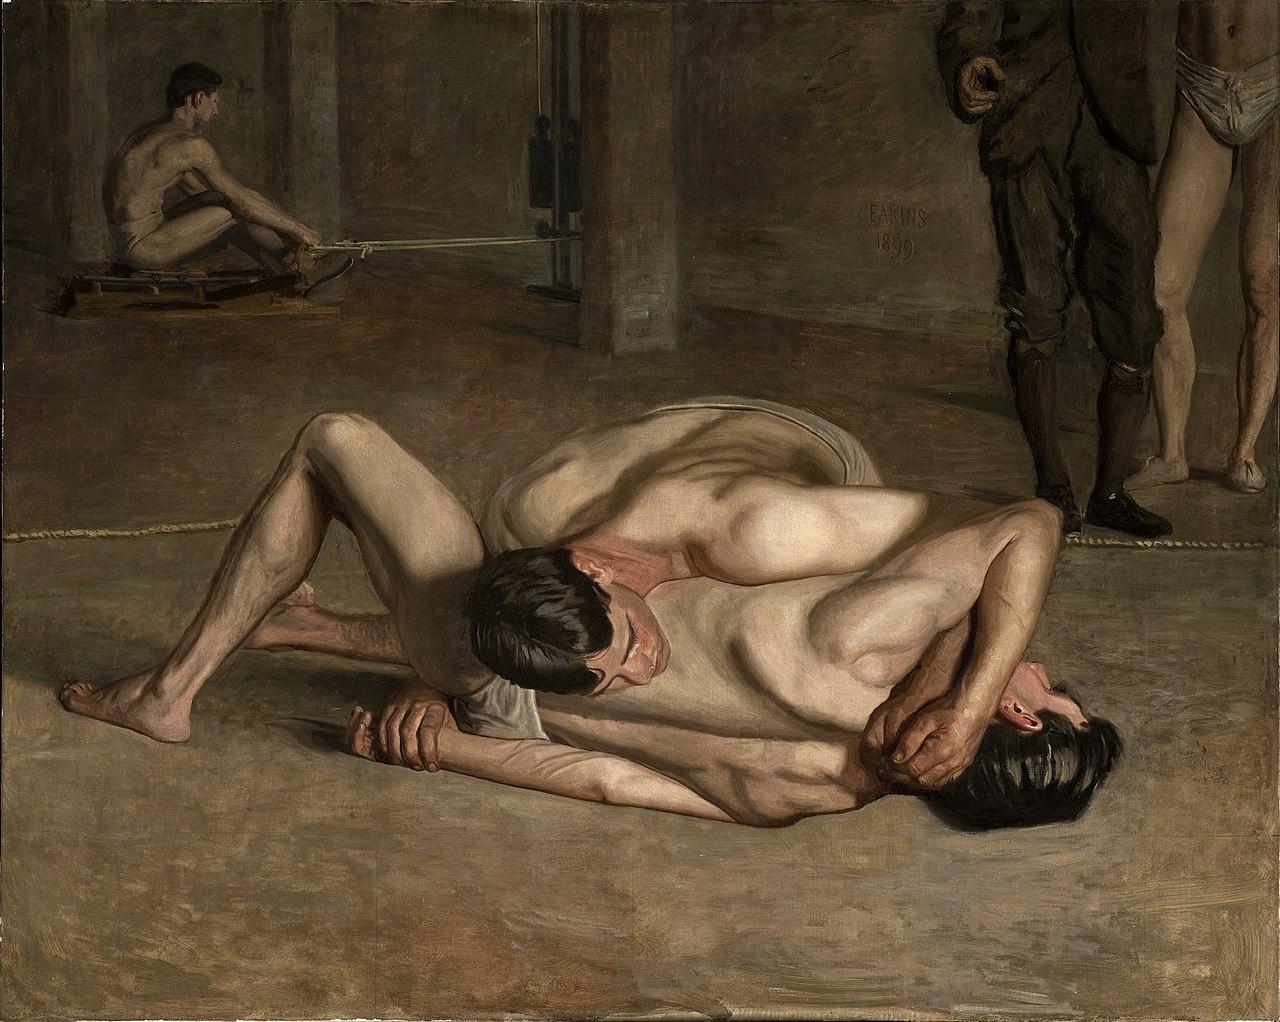 1280px-Eakins,_Thomas_-_Wrestlers_1899